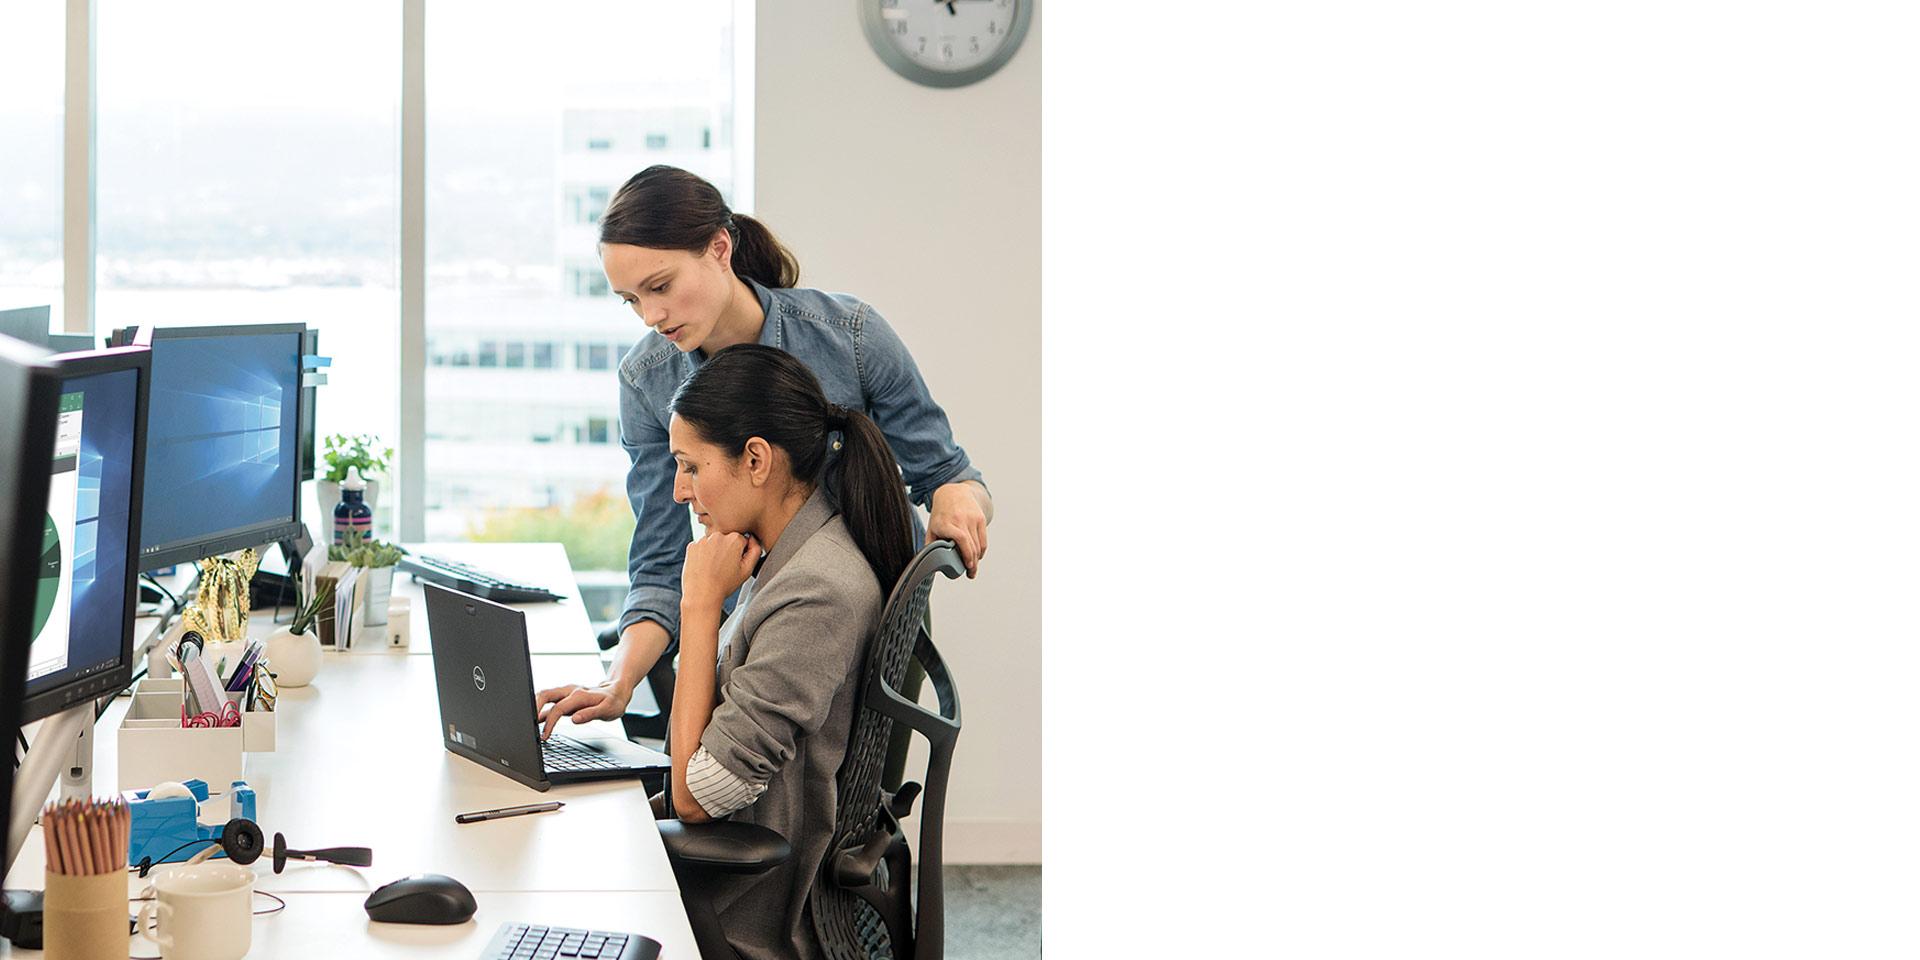 2 women reviewing a laptop